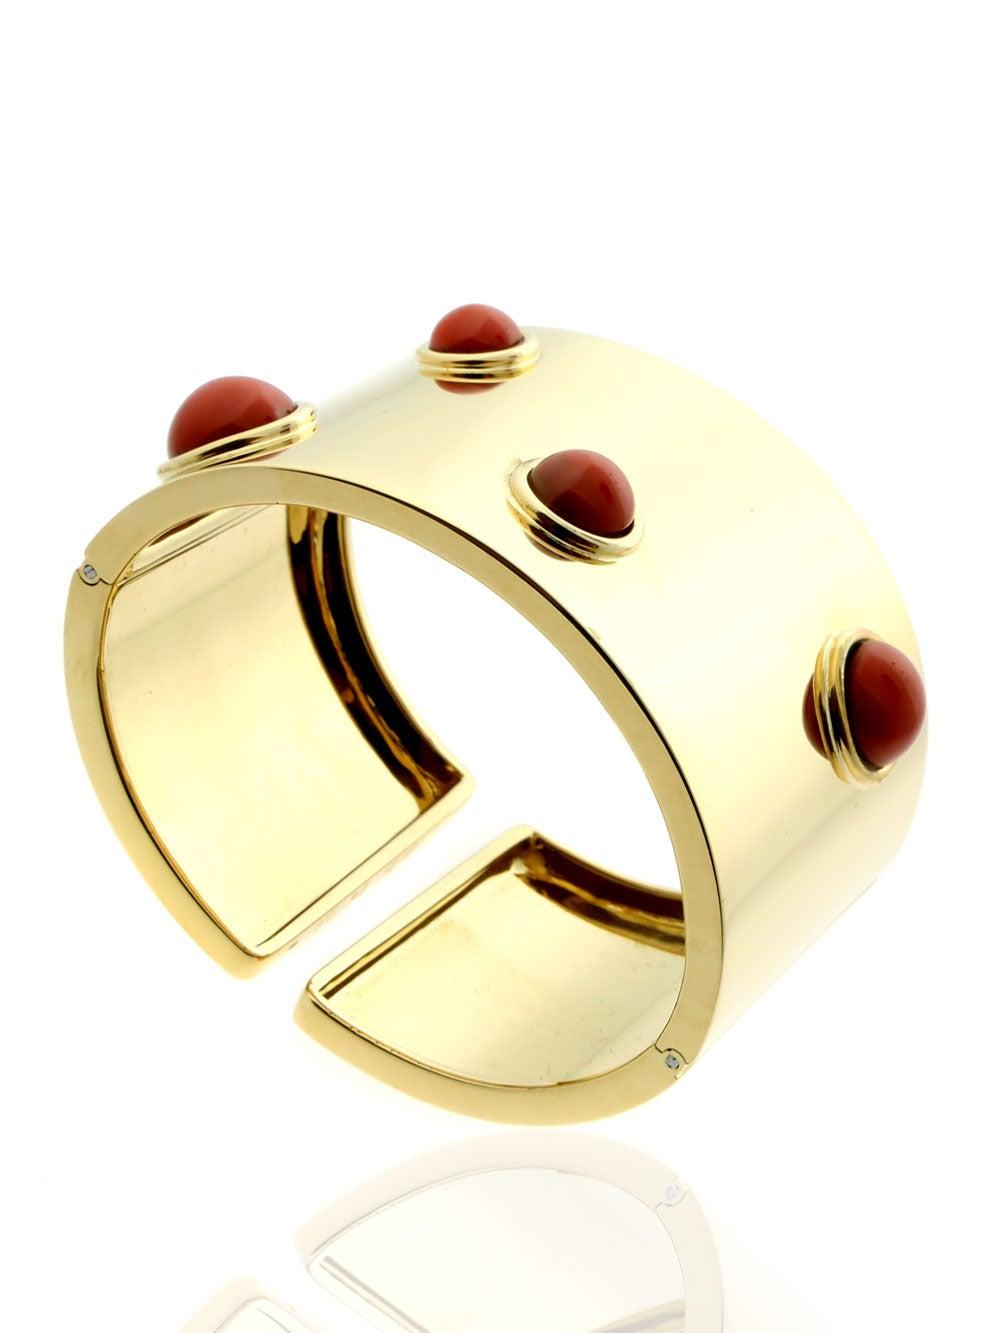 Fred of Paris Coral Gold Arm Cuff Bracelet  6